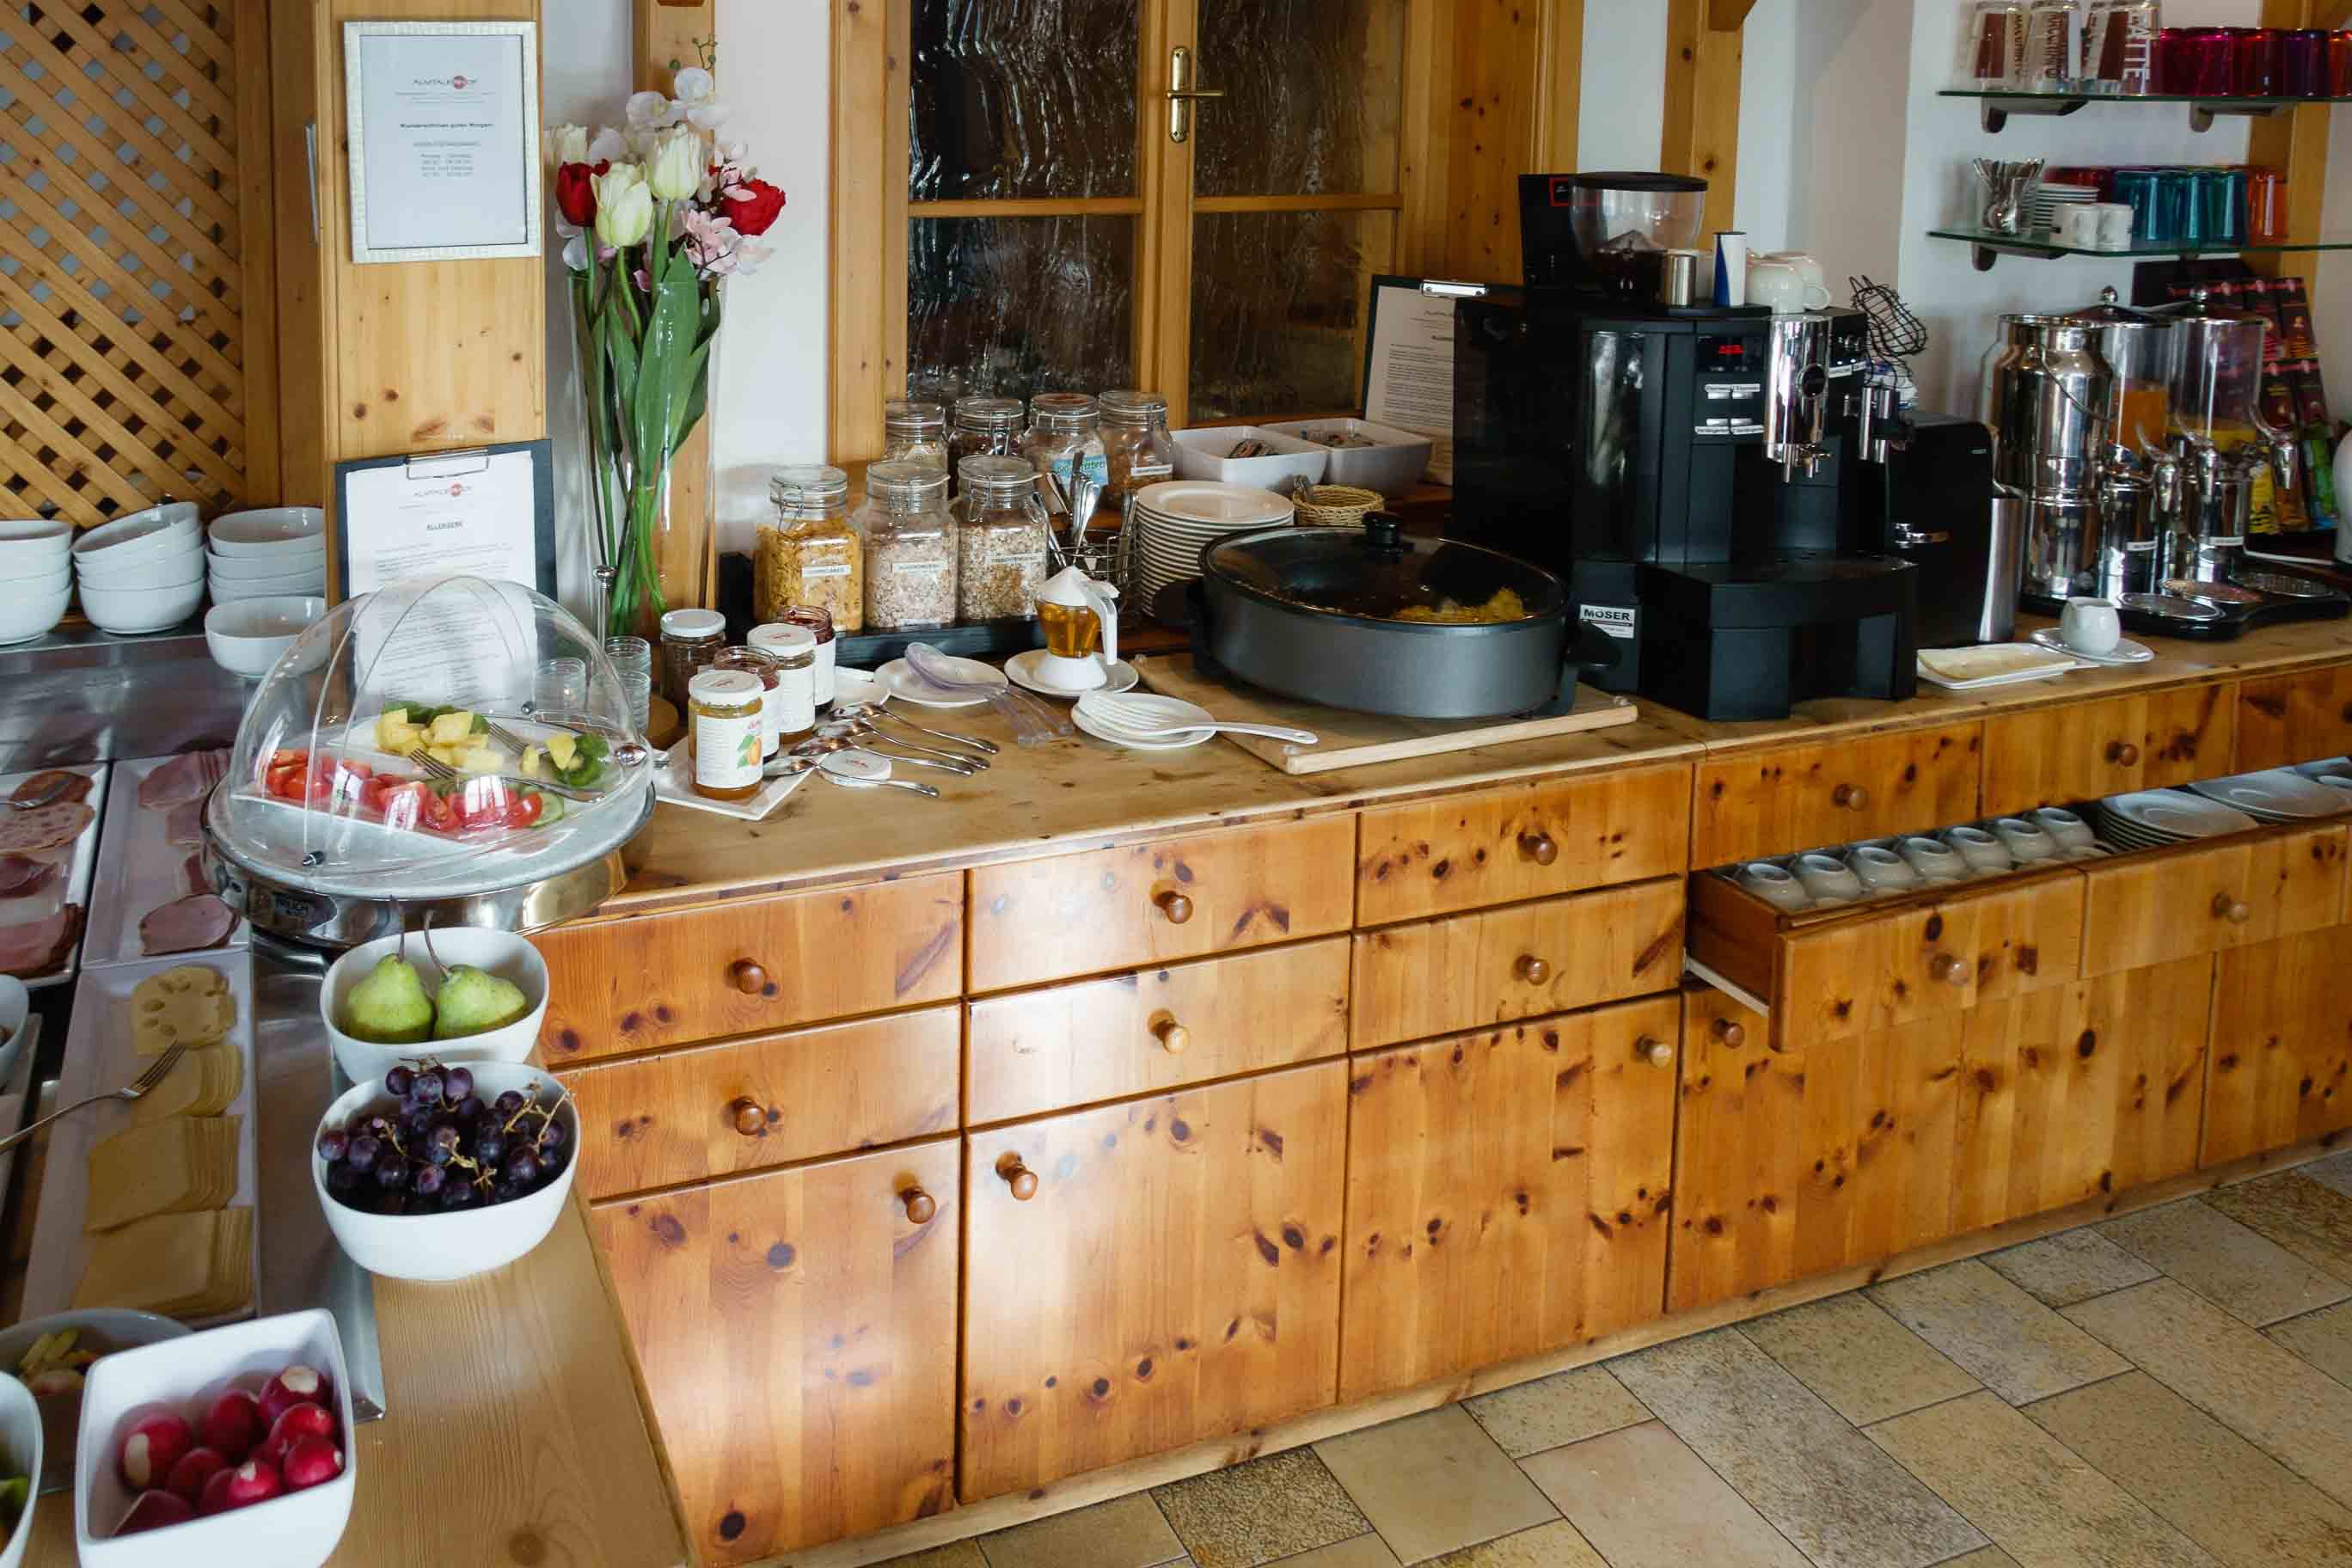 Hotel Almtalerhof Fruehstueck 0581